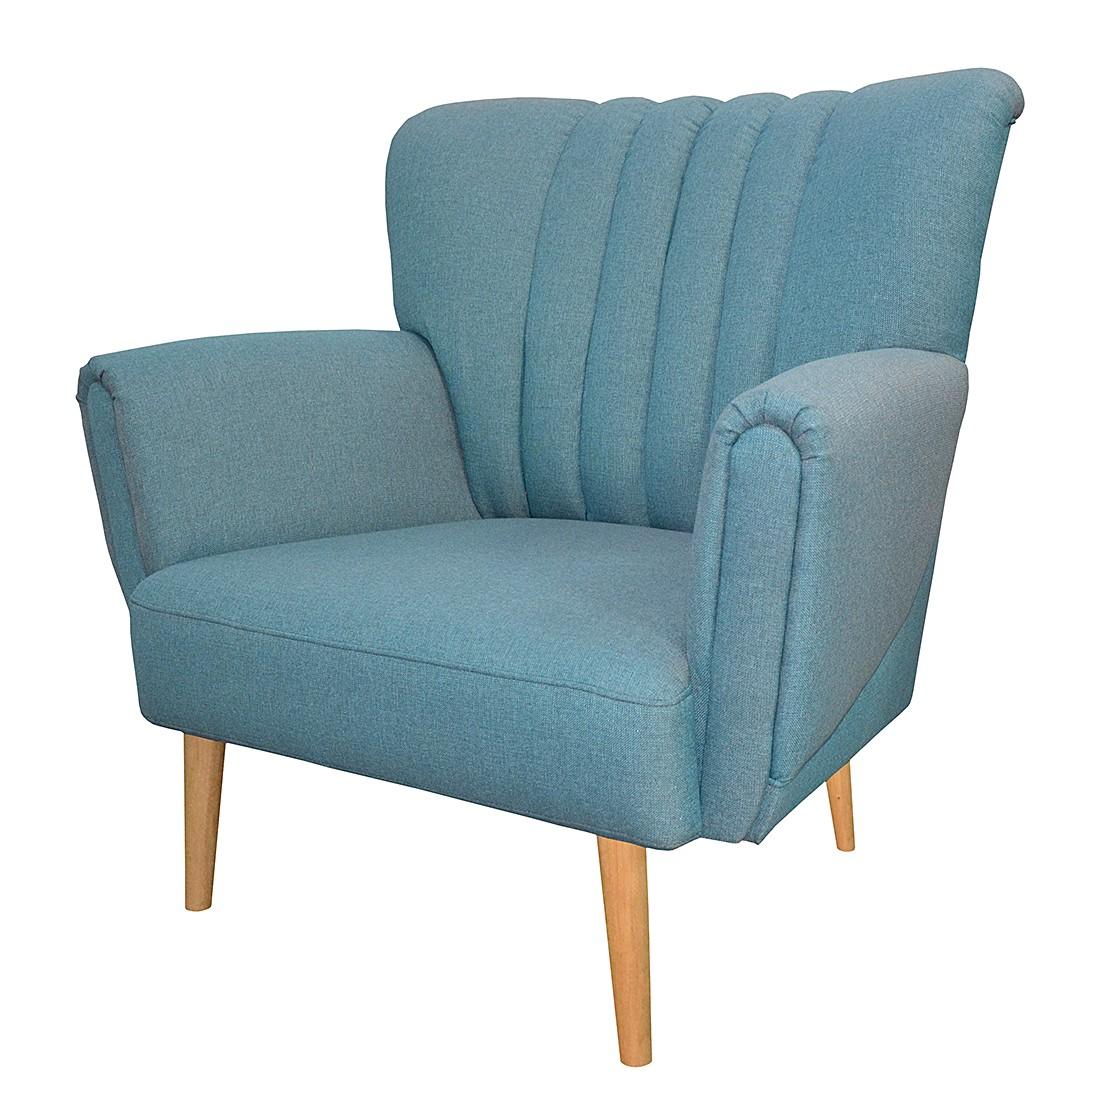 guittet mat 78 hydro confort blanc 15 comparer les prix et promo. Black Bedroom Furniture Sets. Home Design Ideas